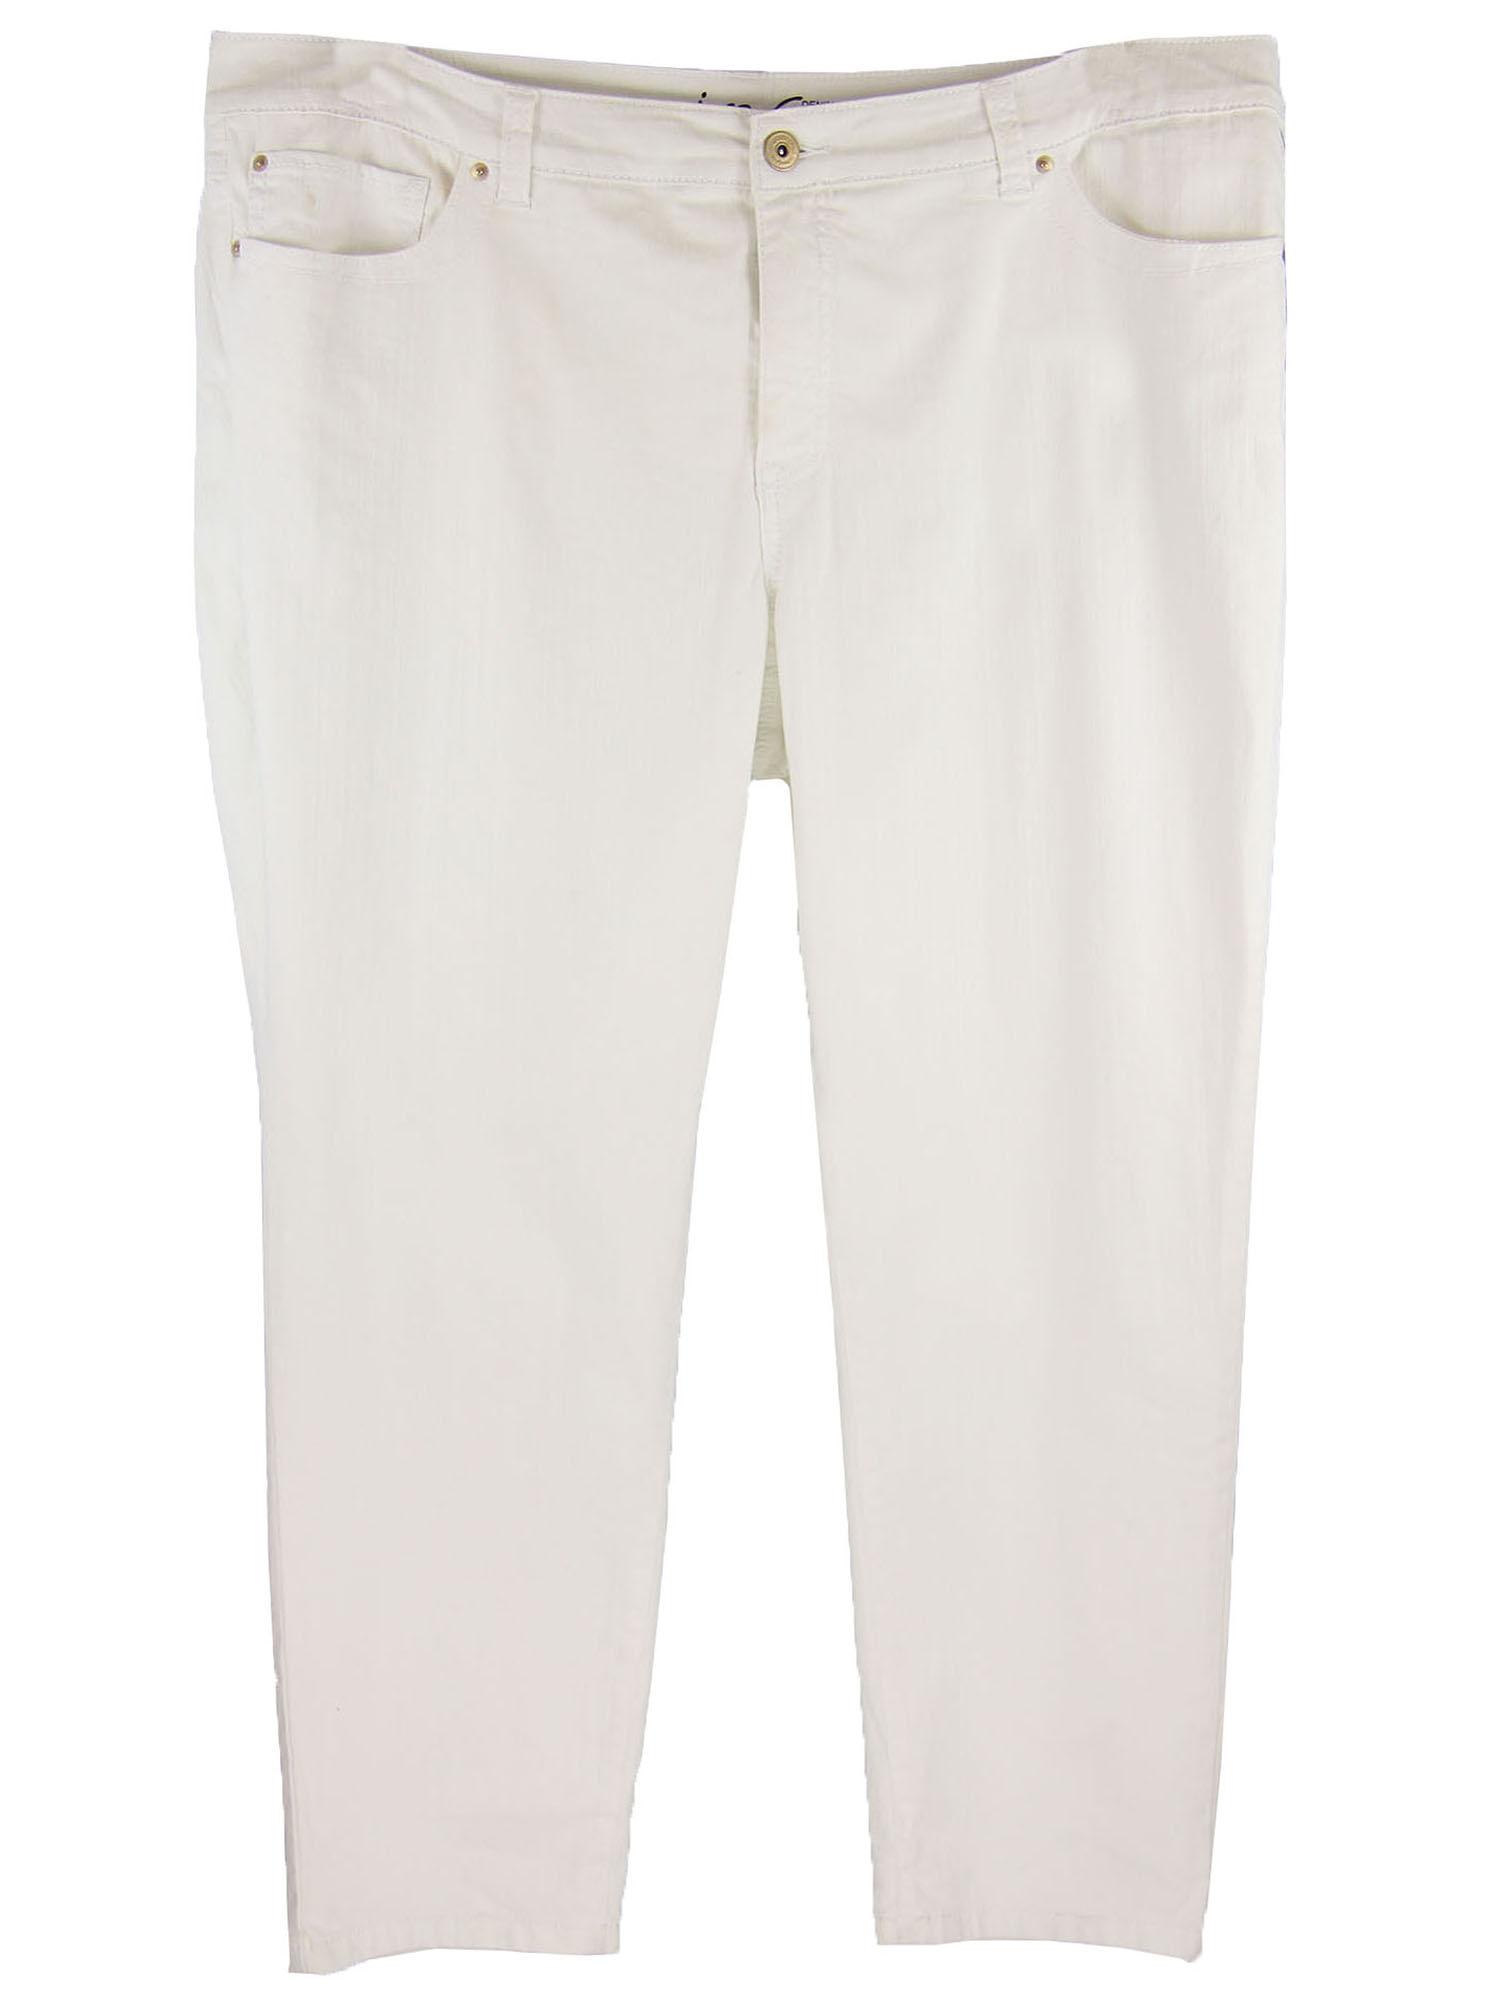 INC Women's Plus Size Slim Tech Fit Skinny Jeans 16w Petite White